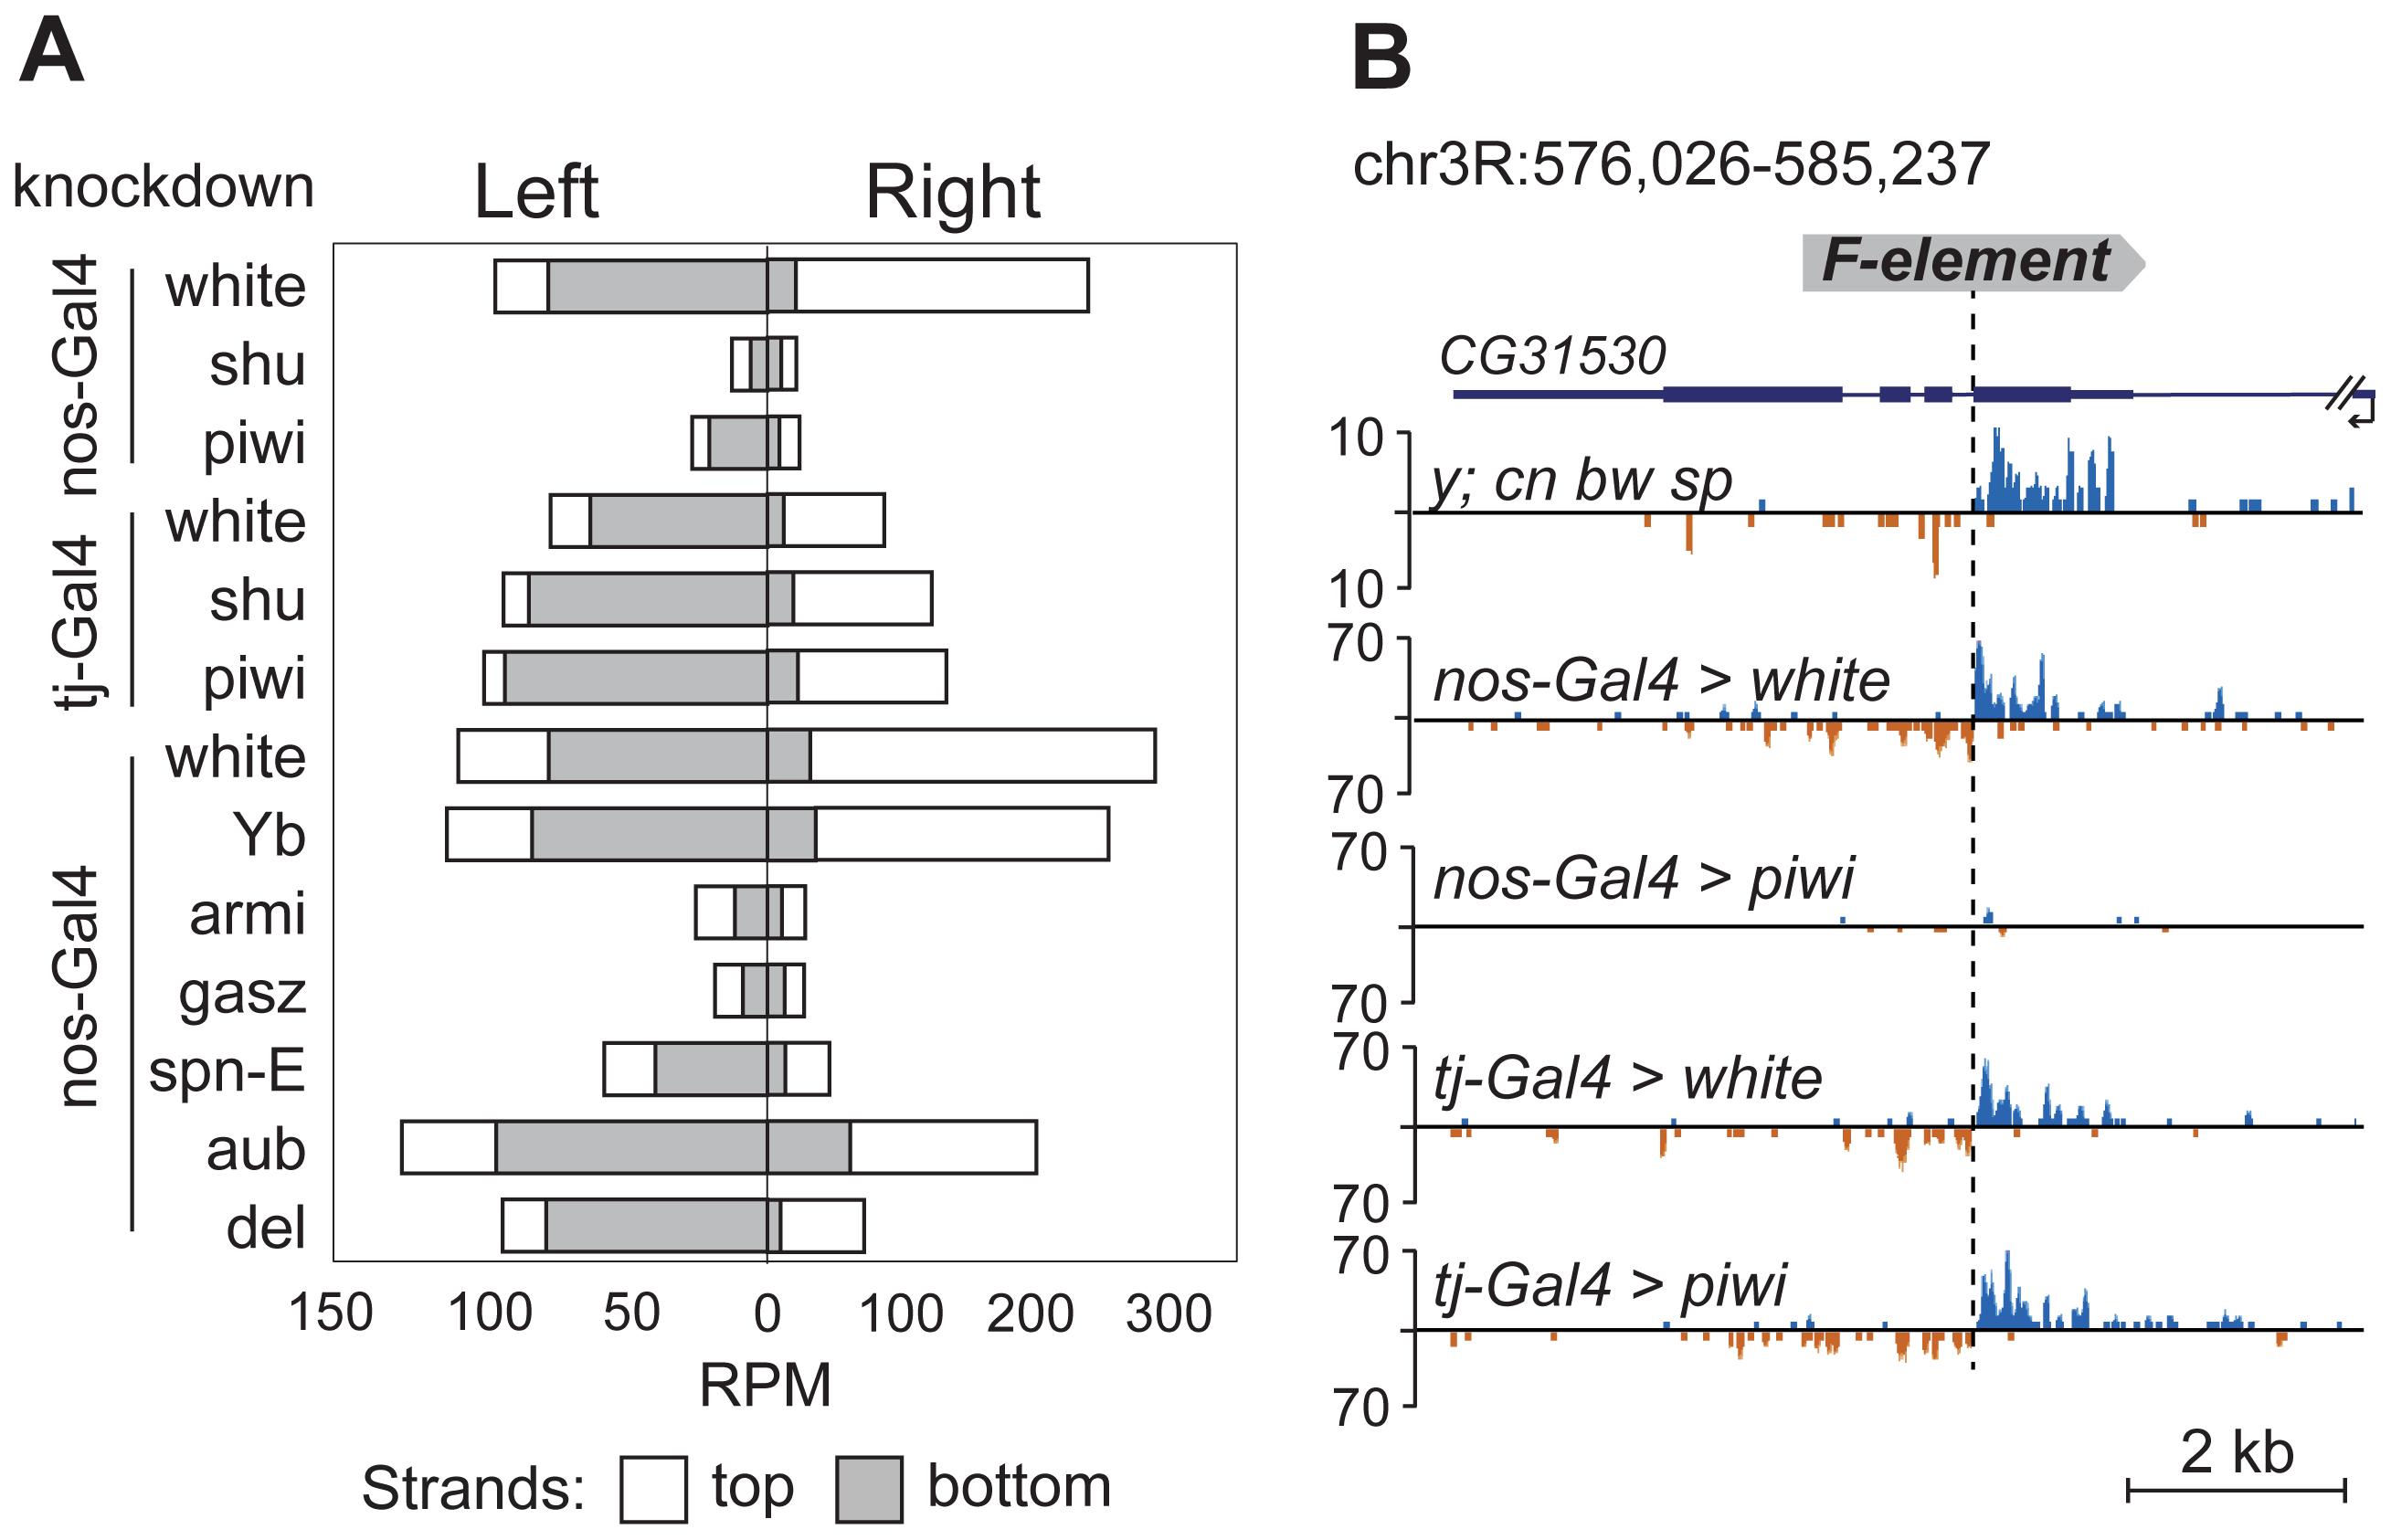 TE-flanking regions produce genuine piRNAs.